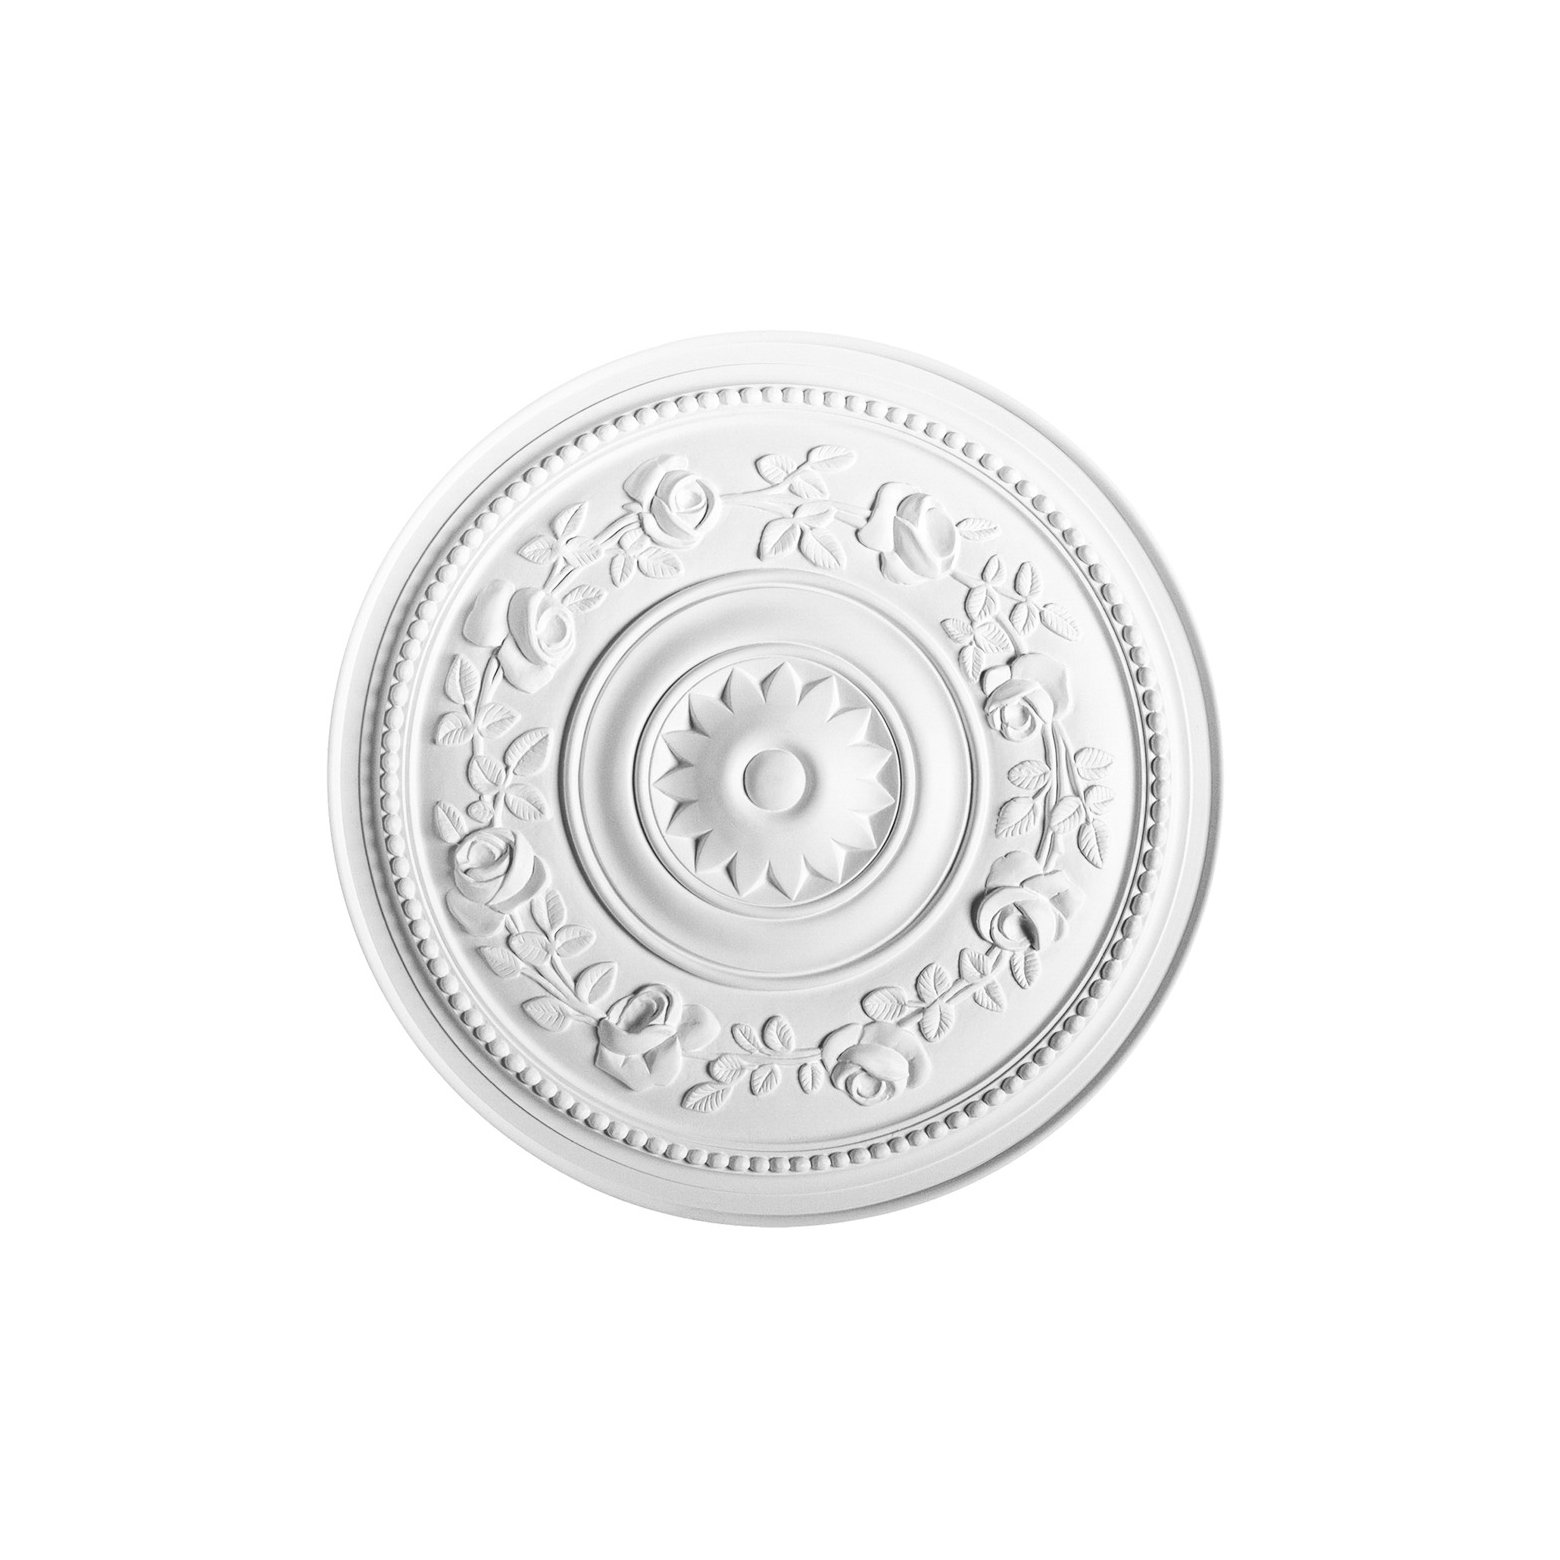 Rozeta R61 śred. 40.0 cm (H: 3.1 cm)